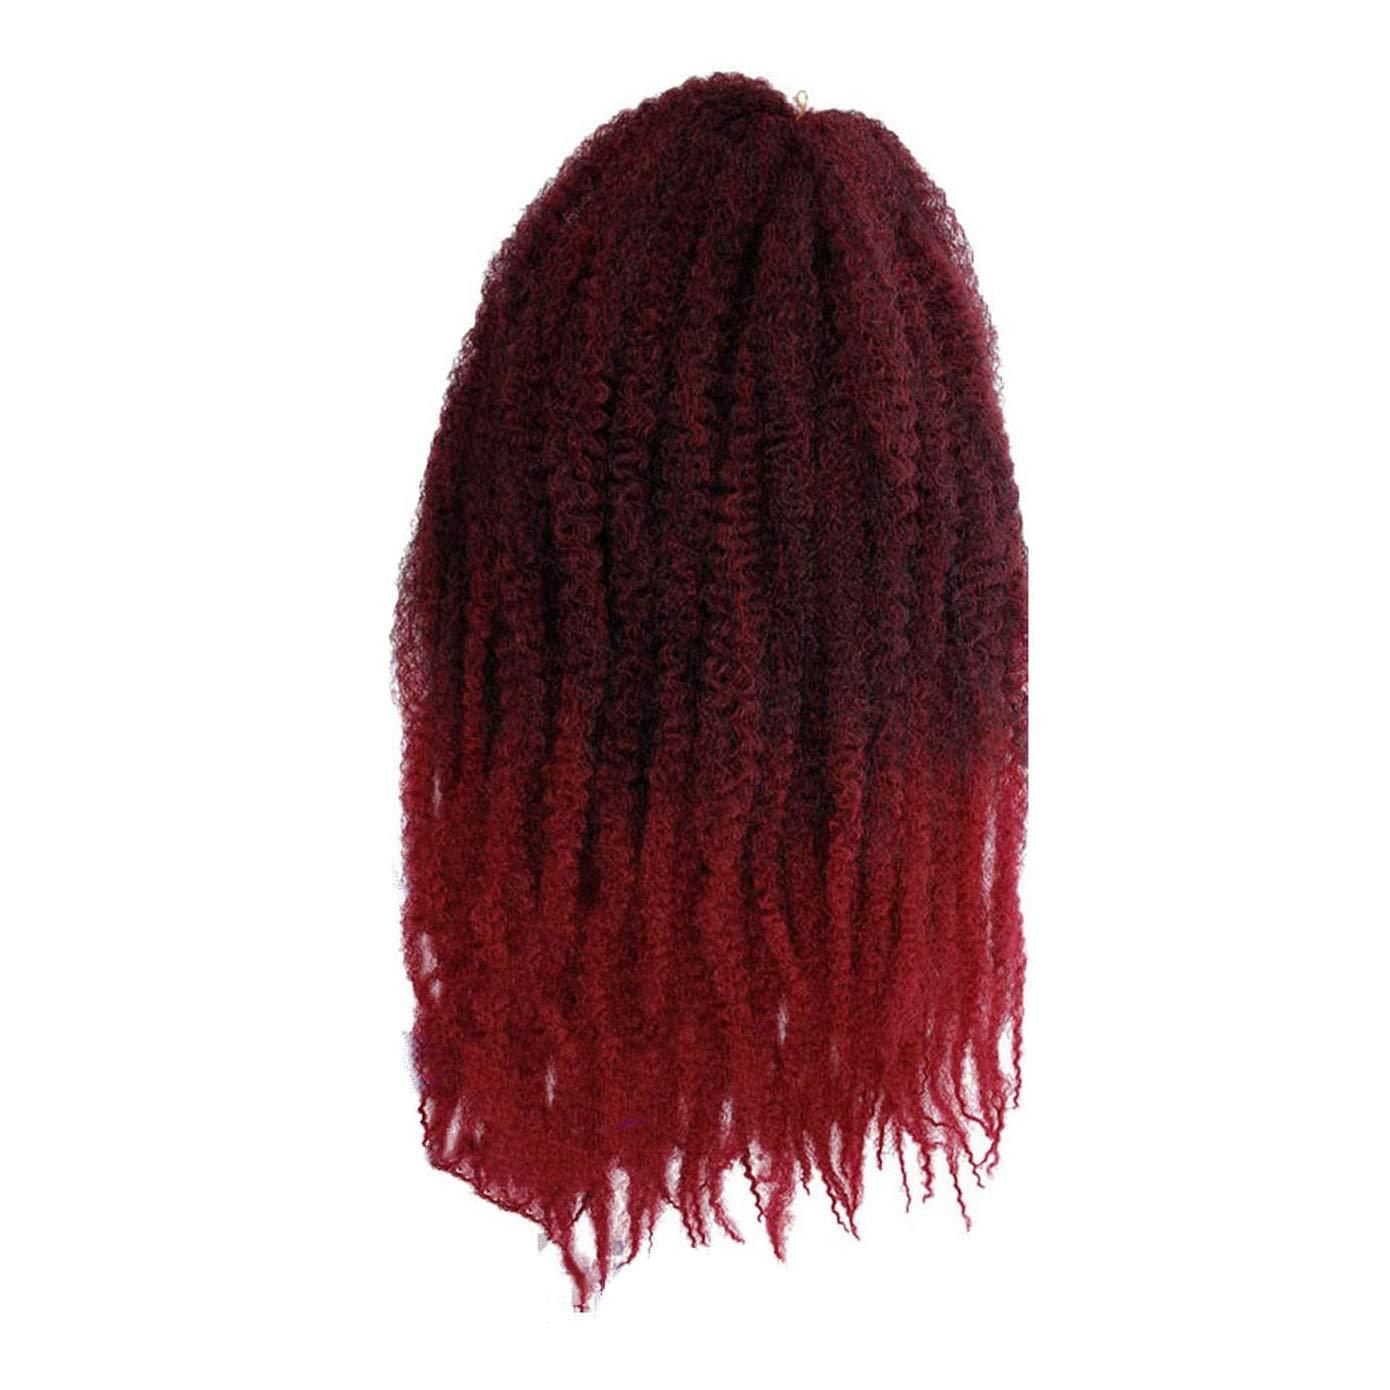 Crochet Braids Hair Ombre Afro Kinki Soft Synthetic Marley Braiding Hair Crochet Hair Extensions Bulk,T1B/Red,18 inch,7Pcs by Ting room